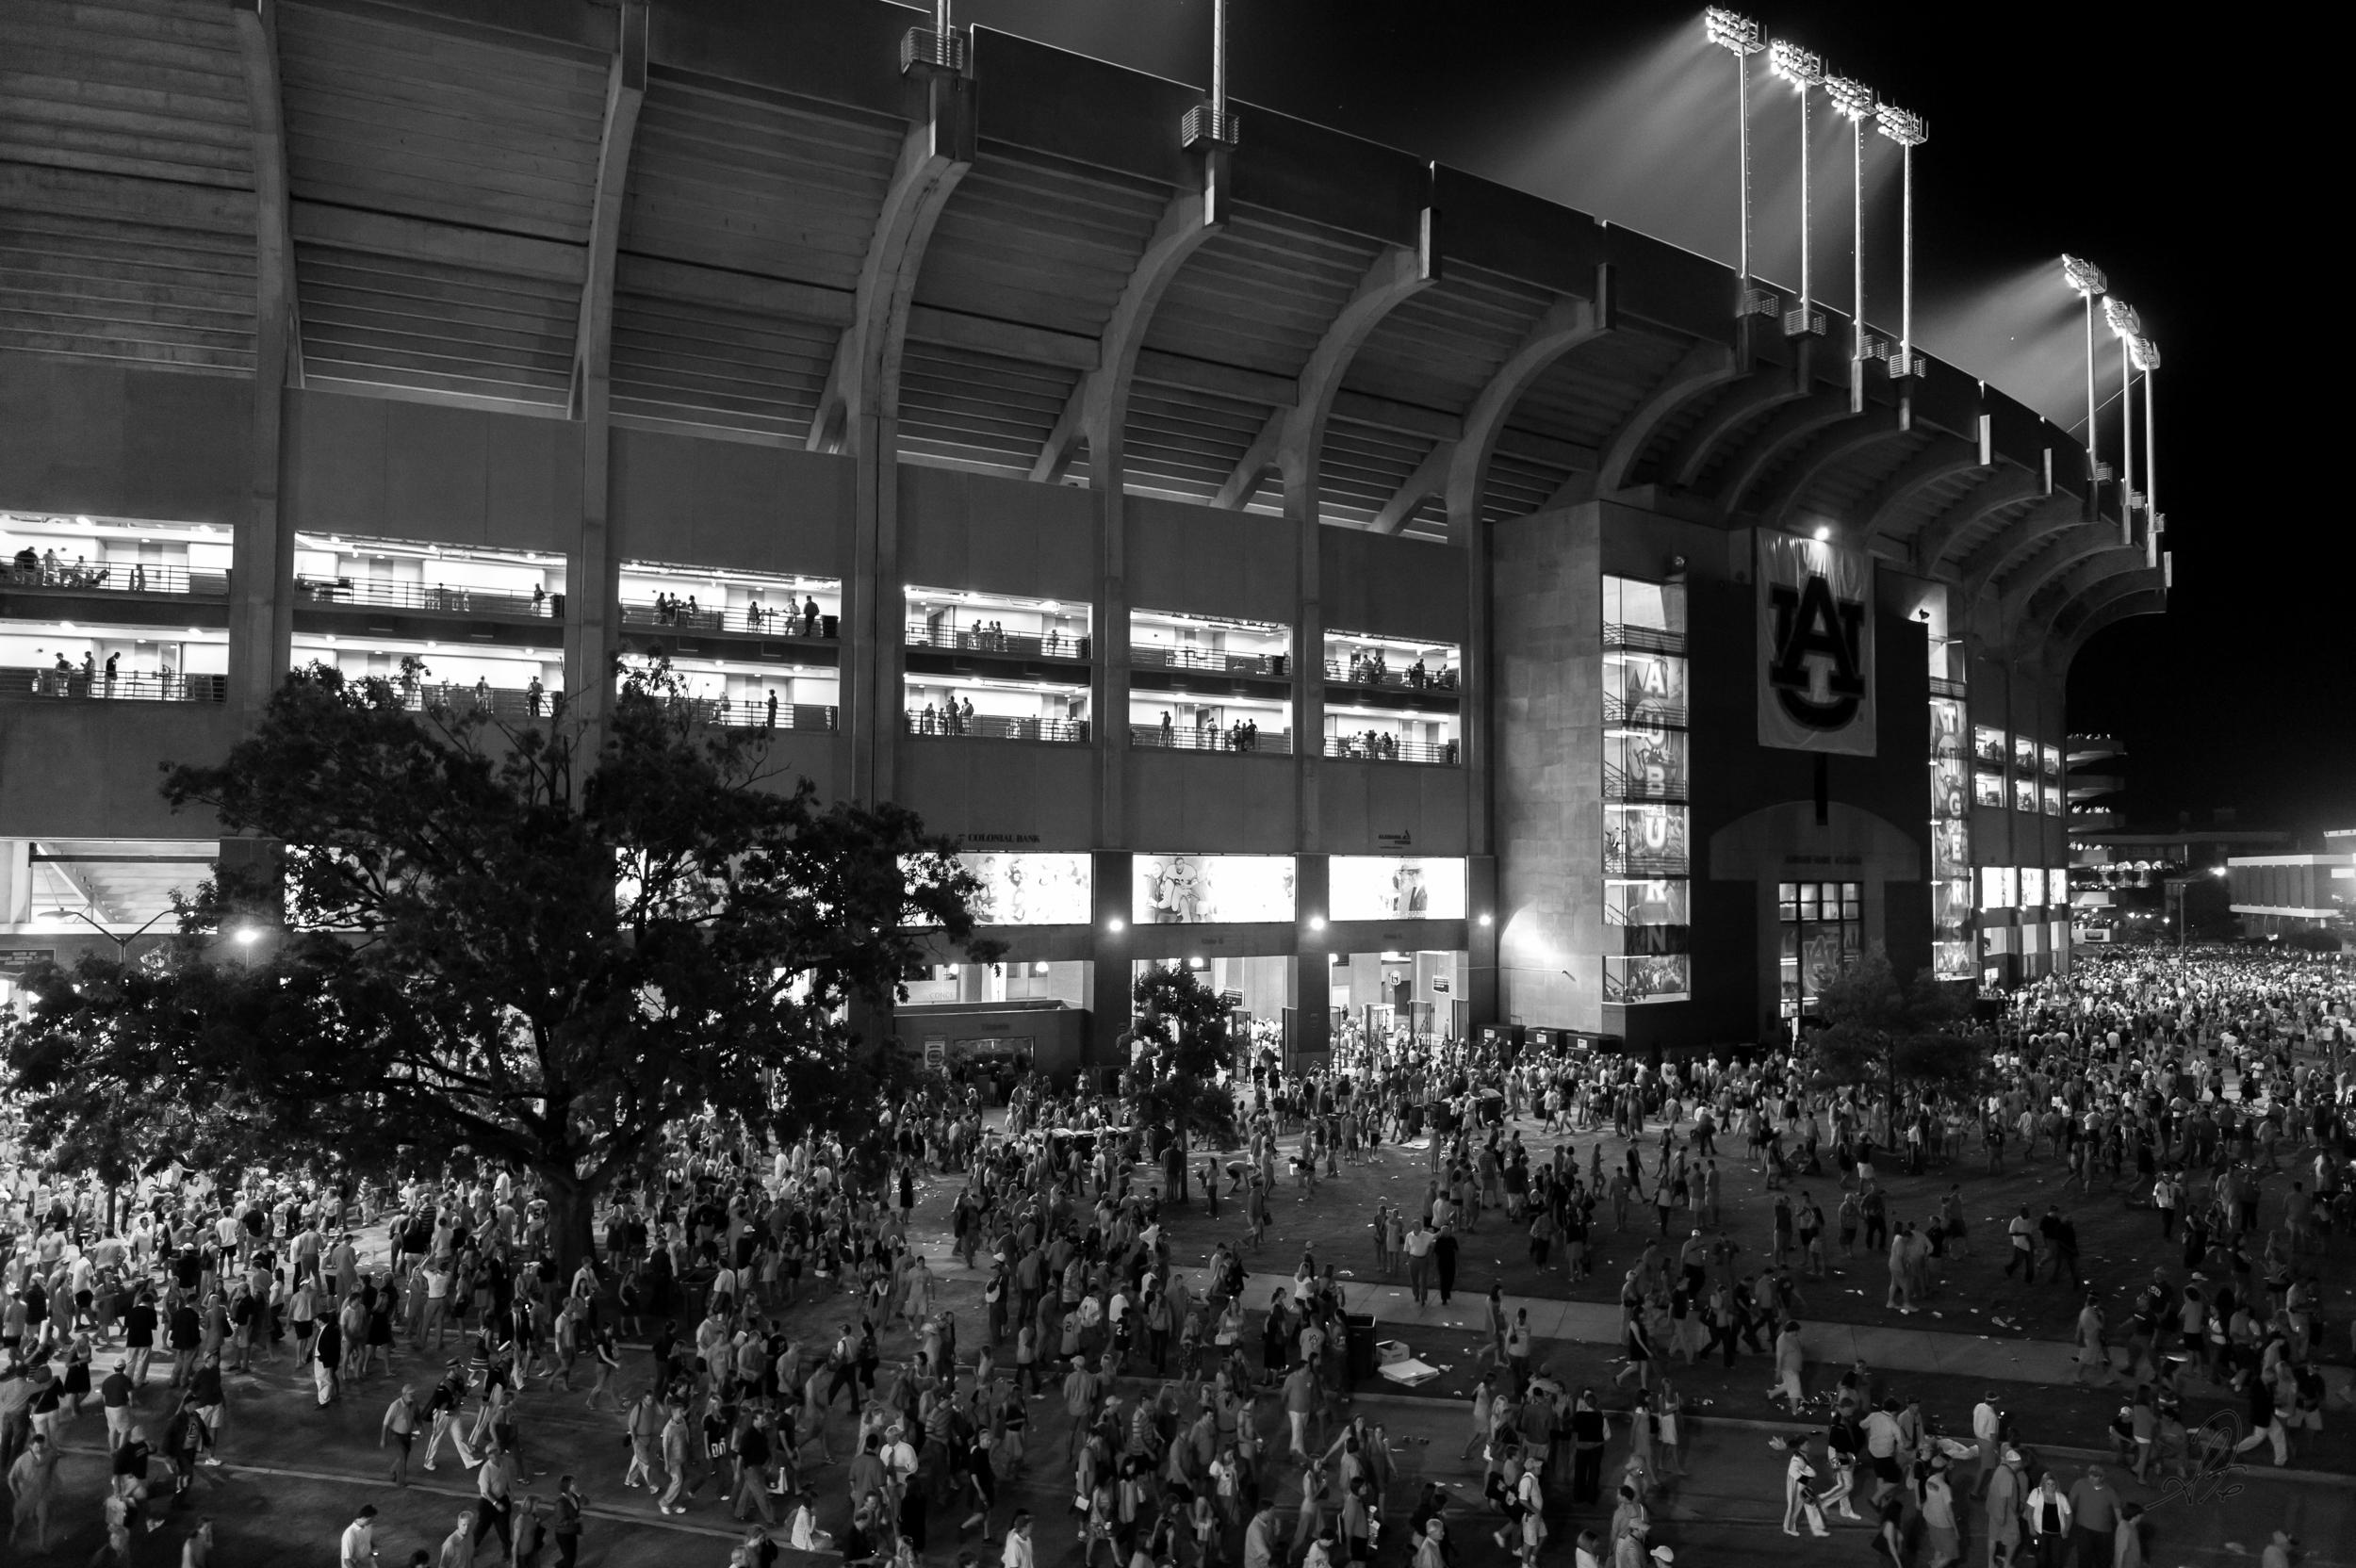 Jordan-Hare Stadium at Night (_d7a4859-3)